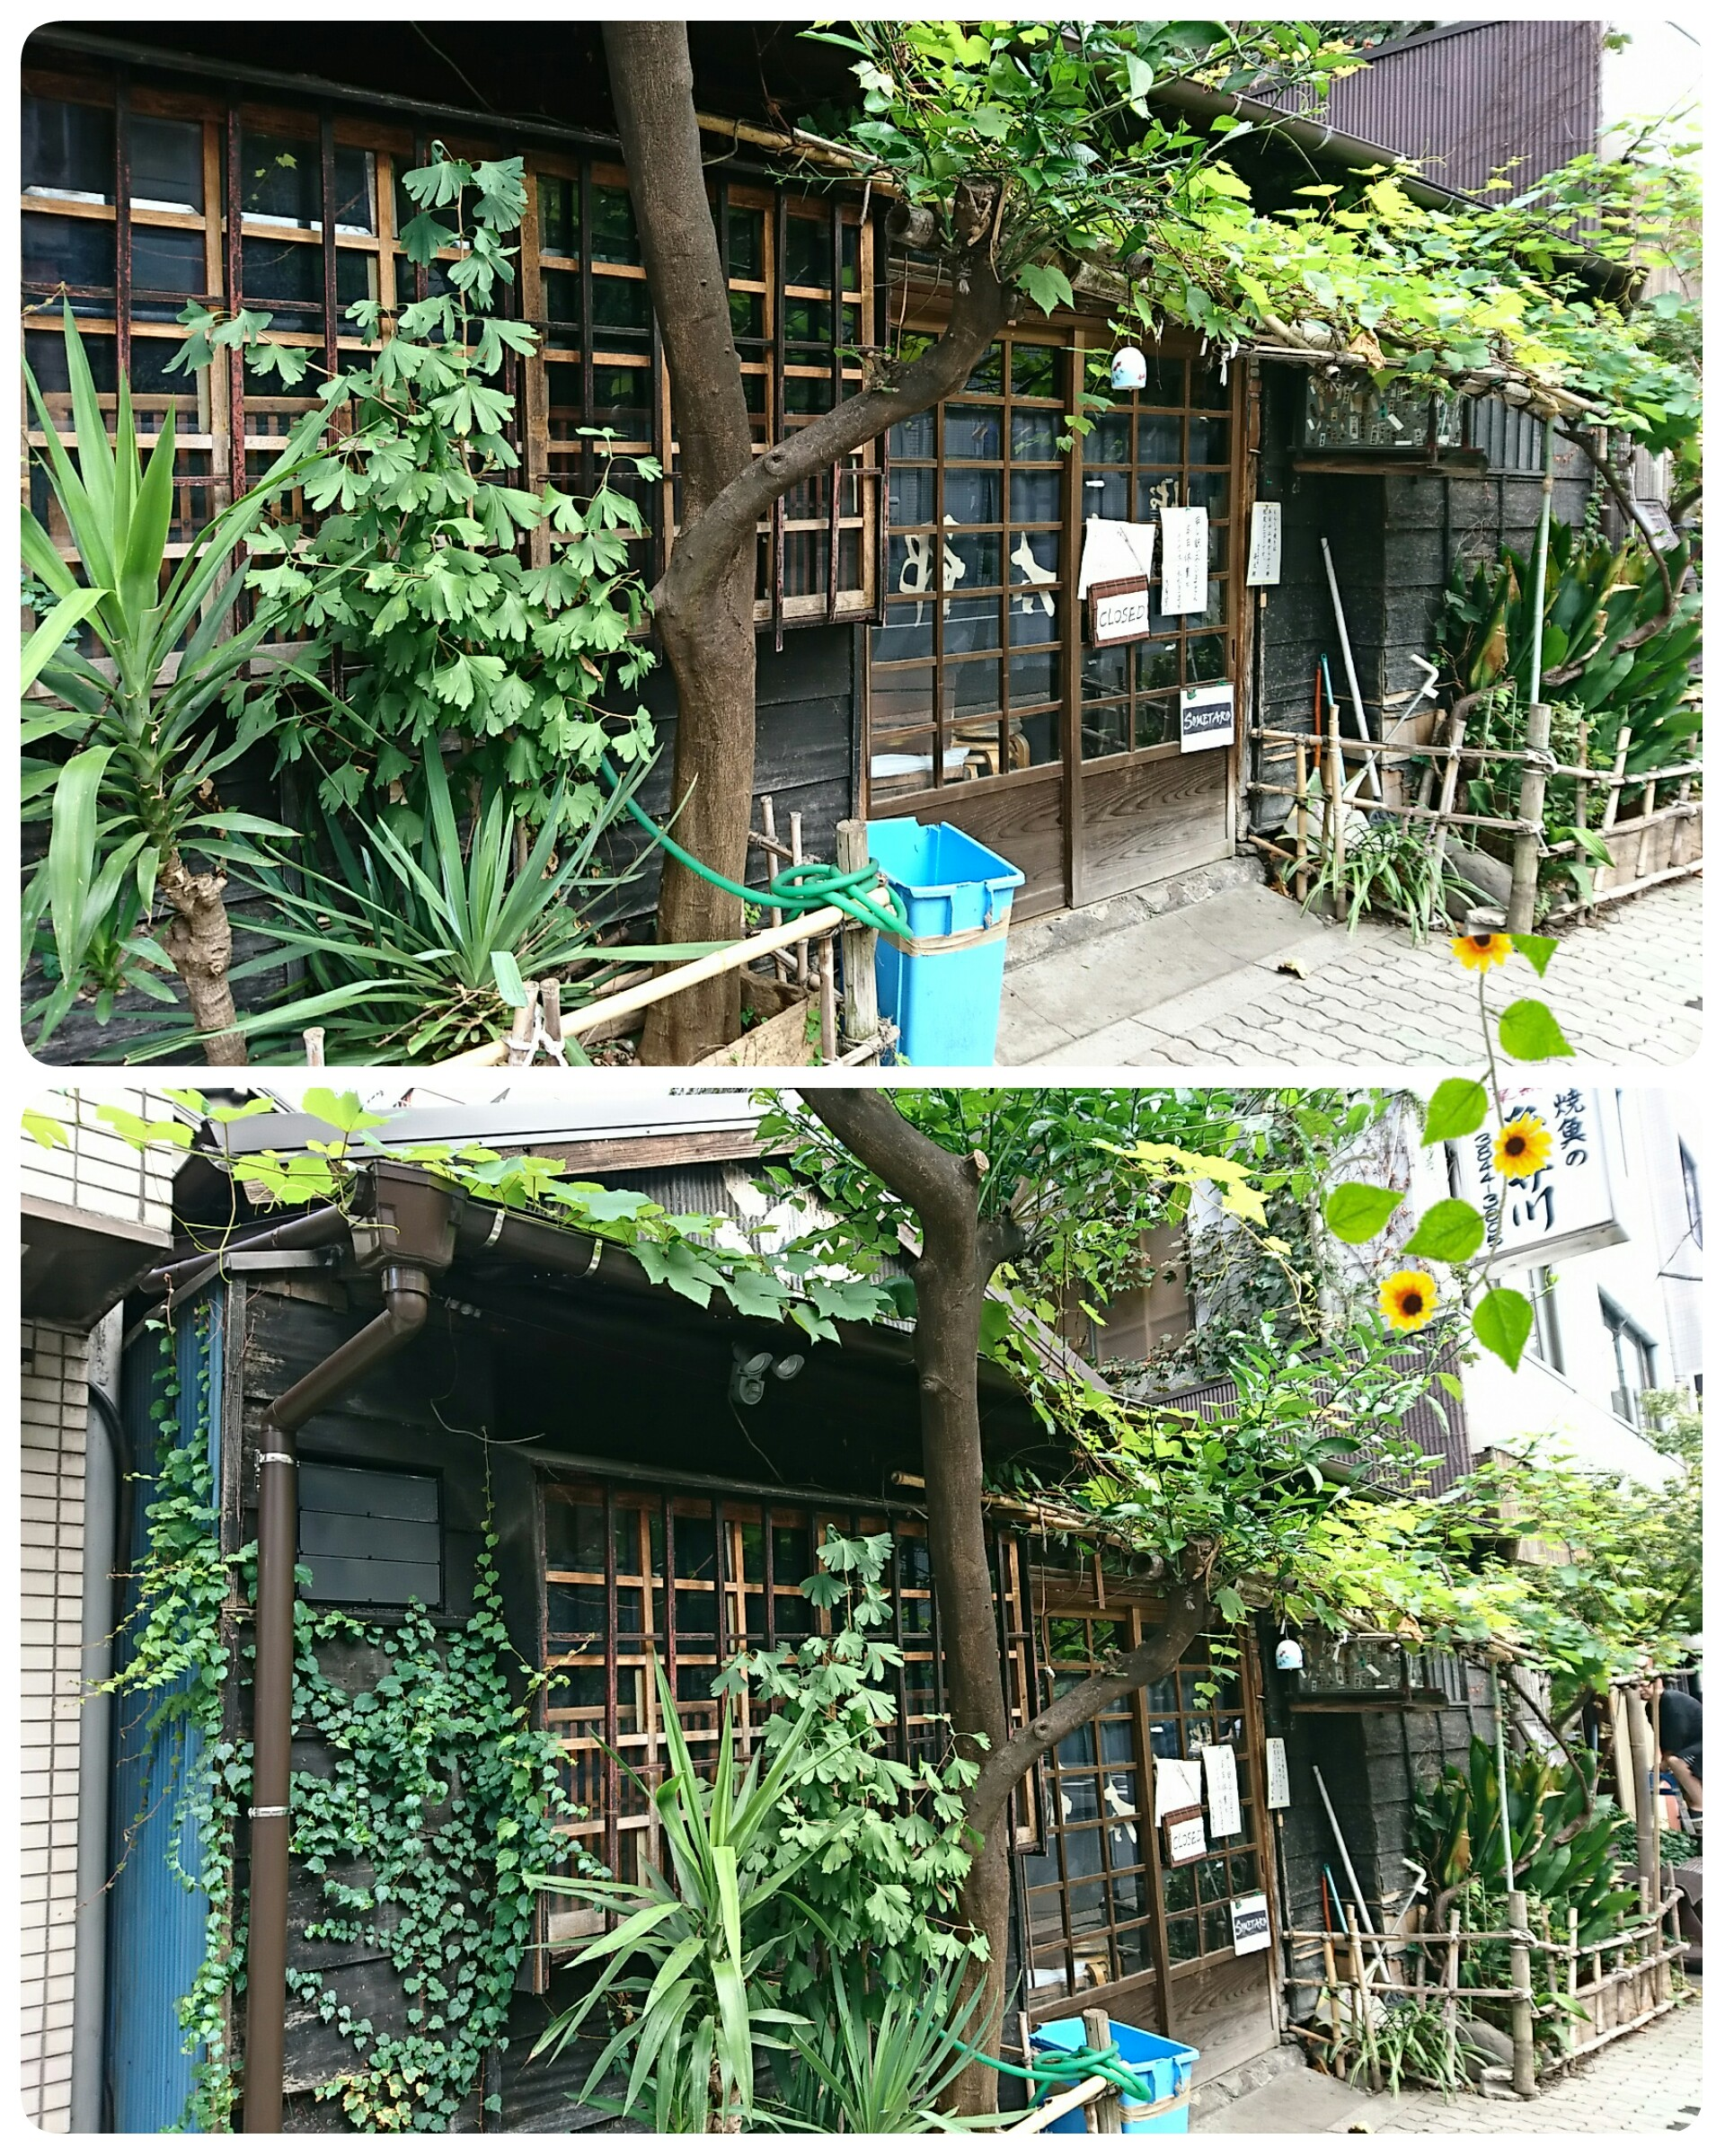 f:id:sunflower-shigeaki:20171007231037j:image